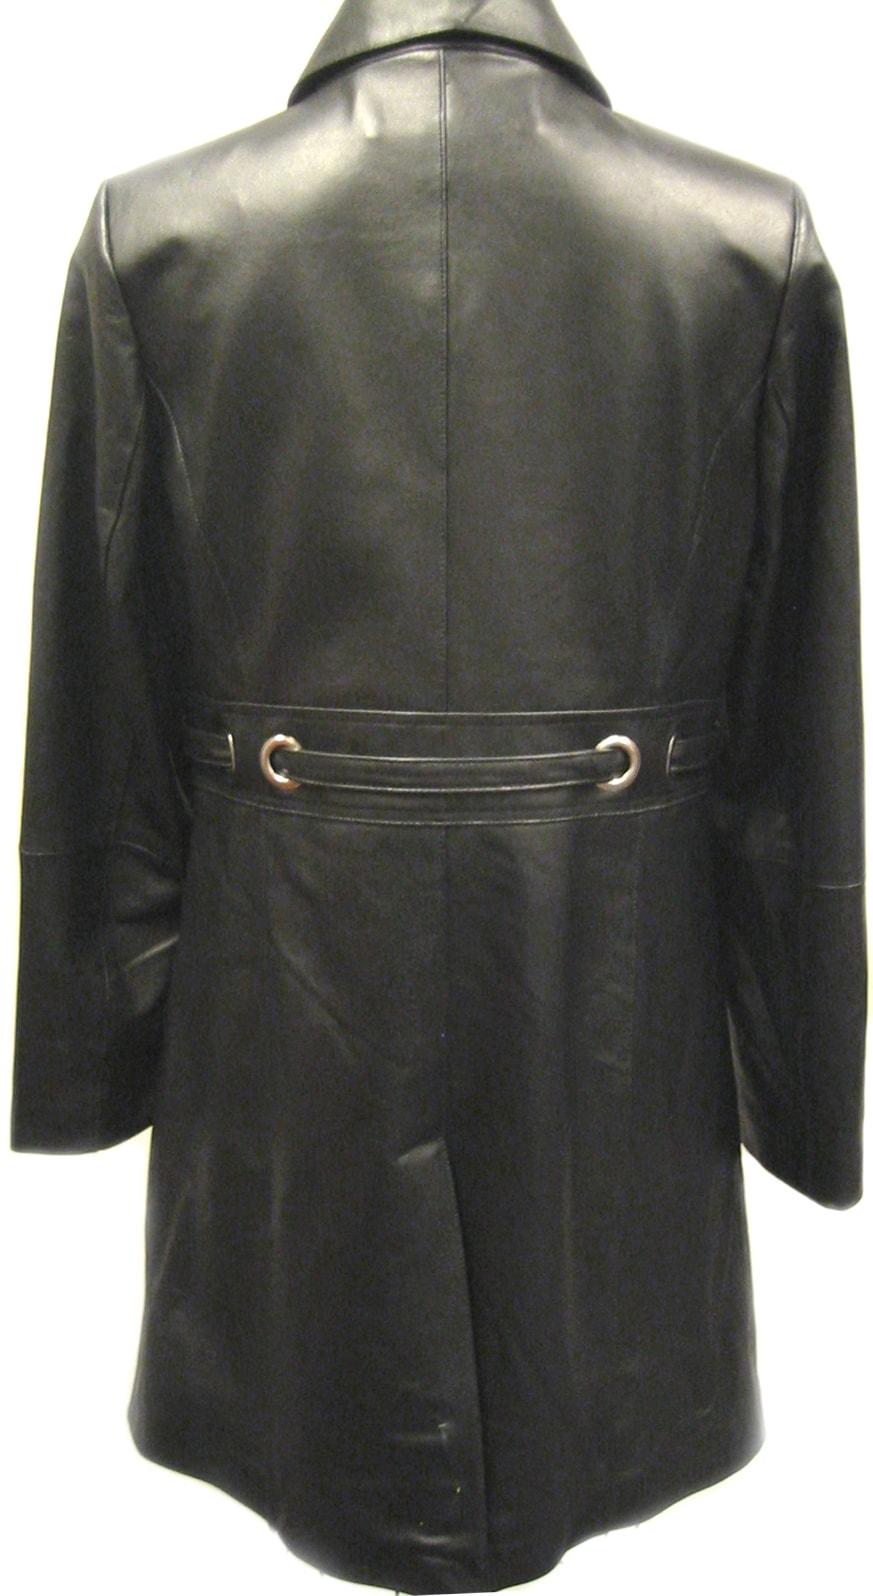 Komitor Women's 3/4 Length Plus Size Leather Coat